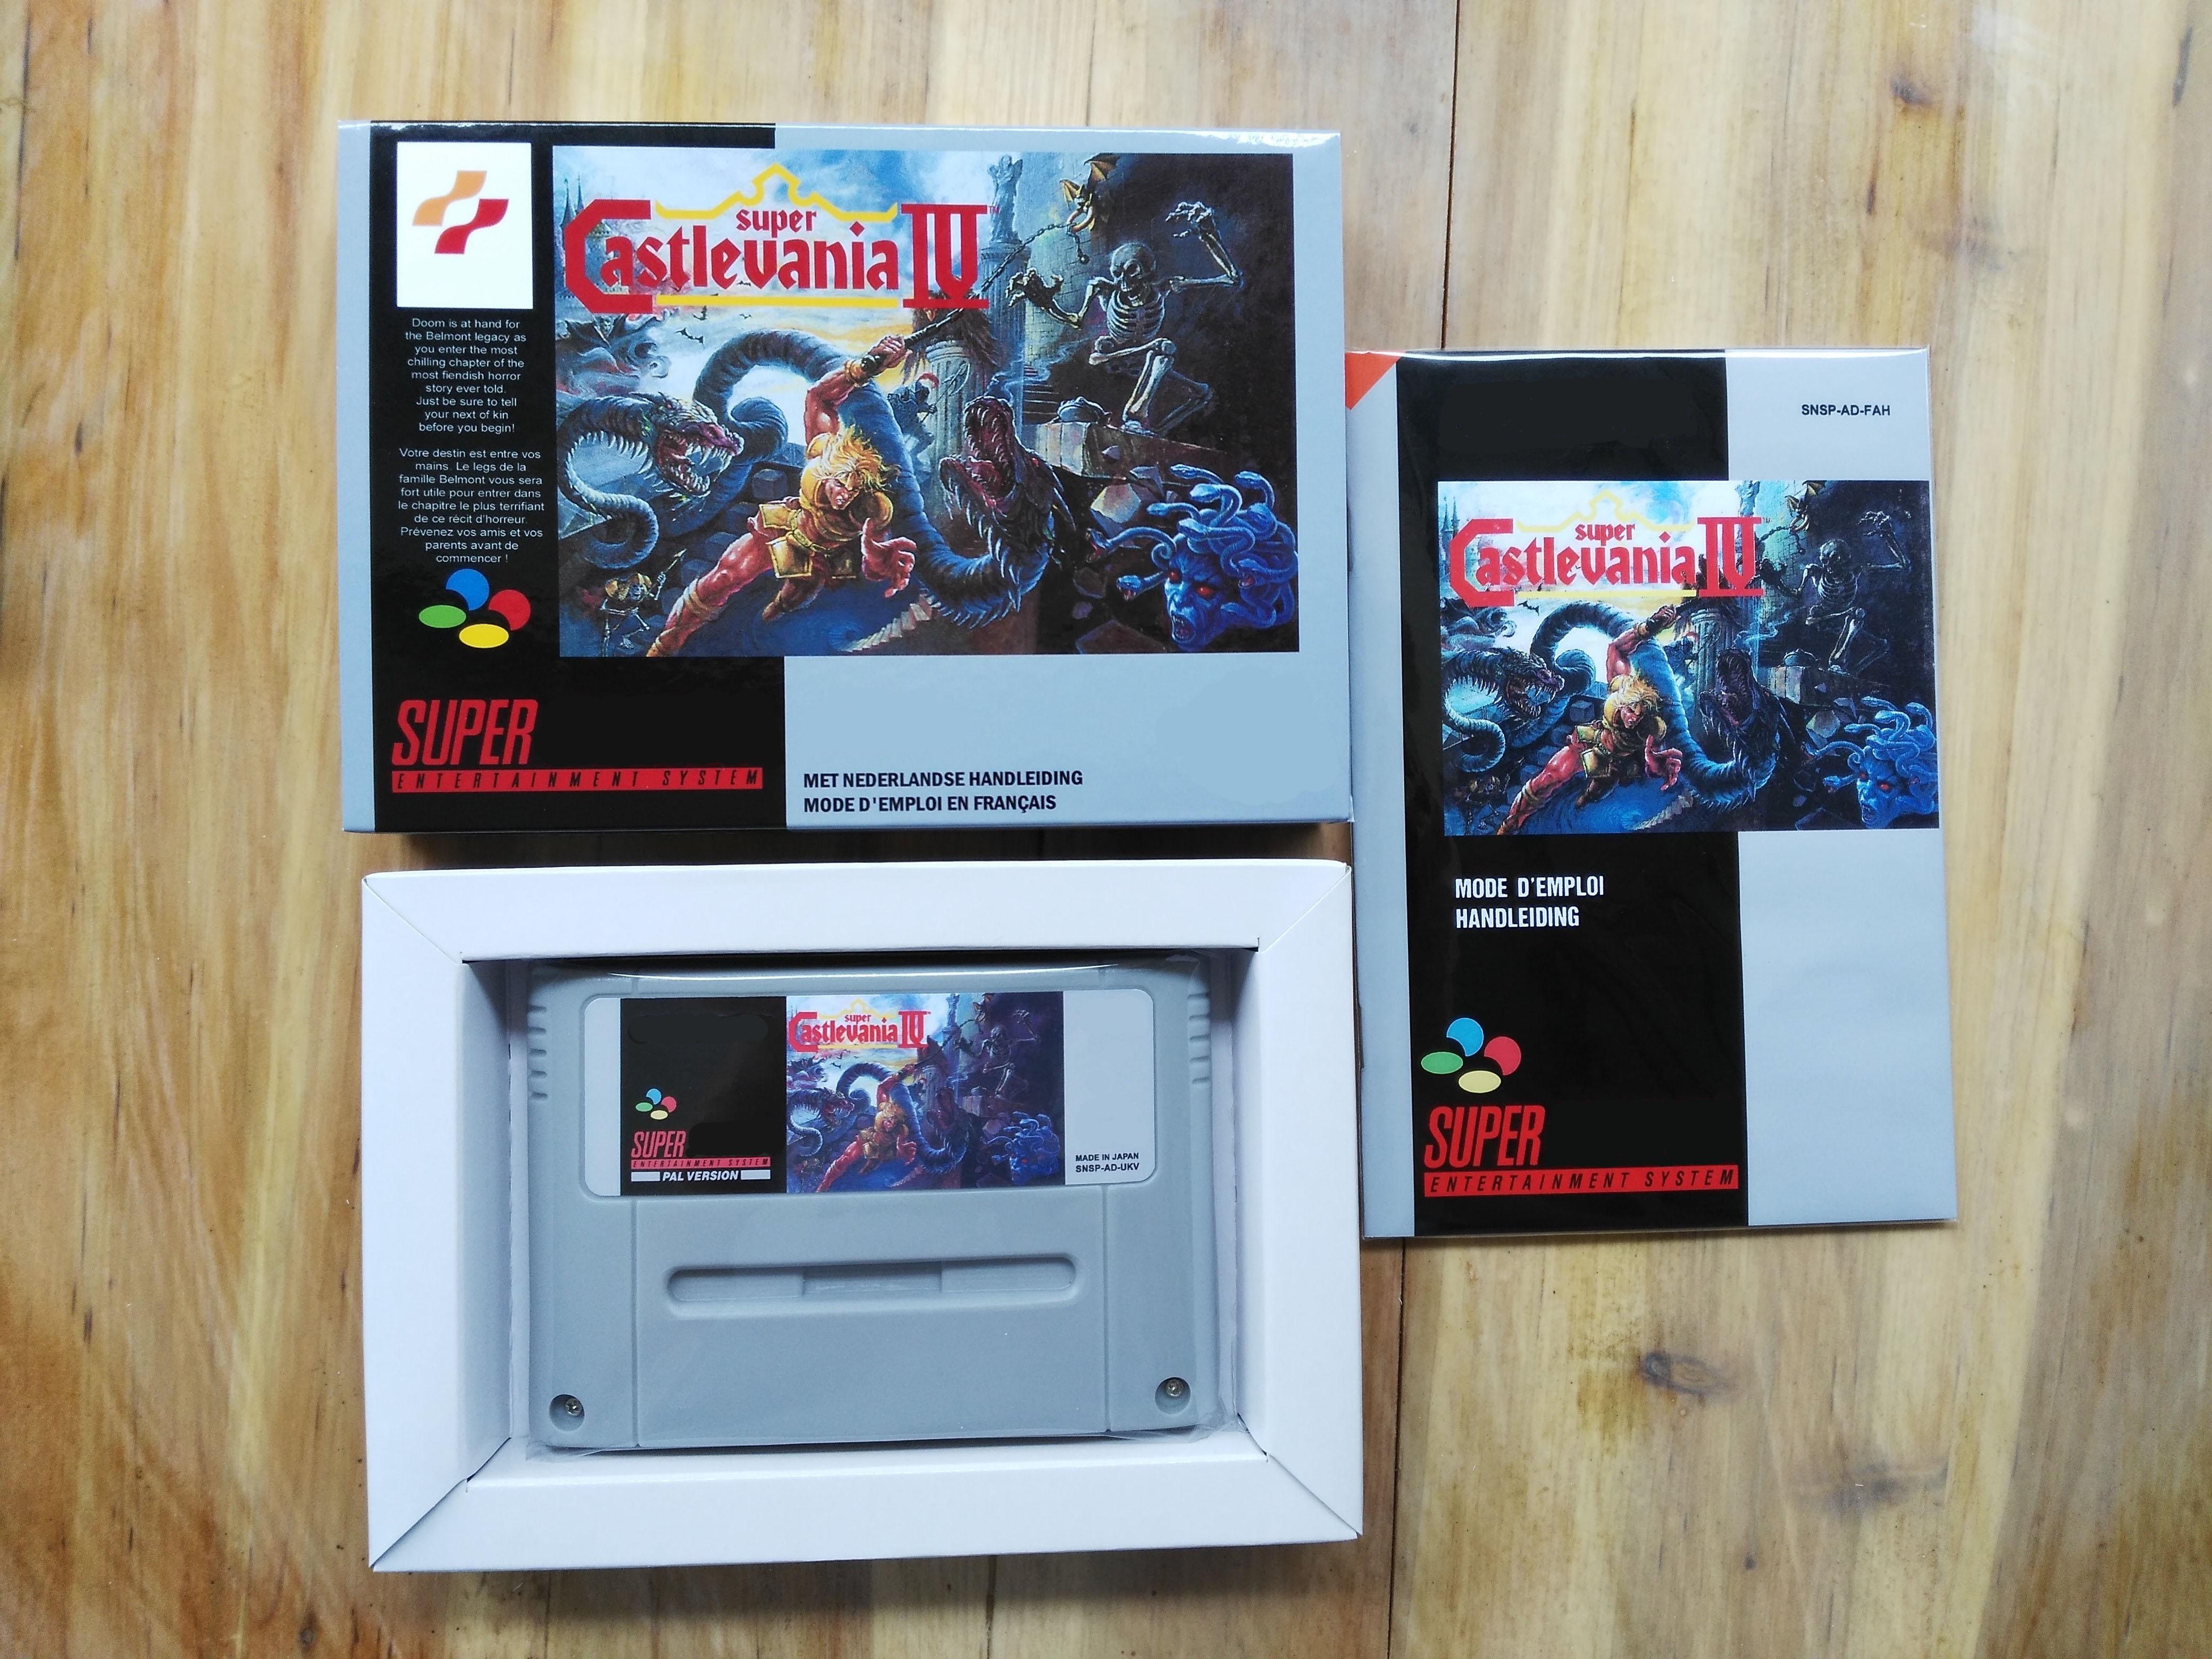 16Bit Games Super Castlevania 4 French PAL Version Box Manual Cartridge